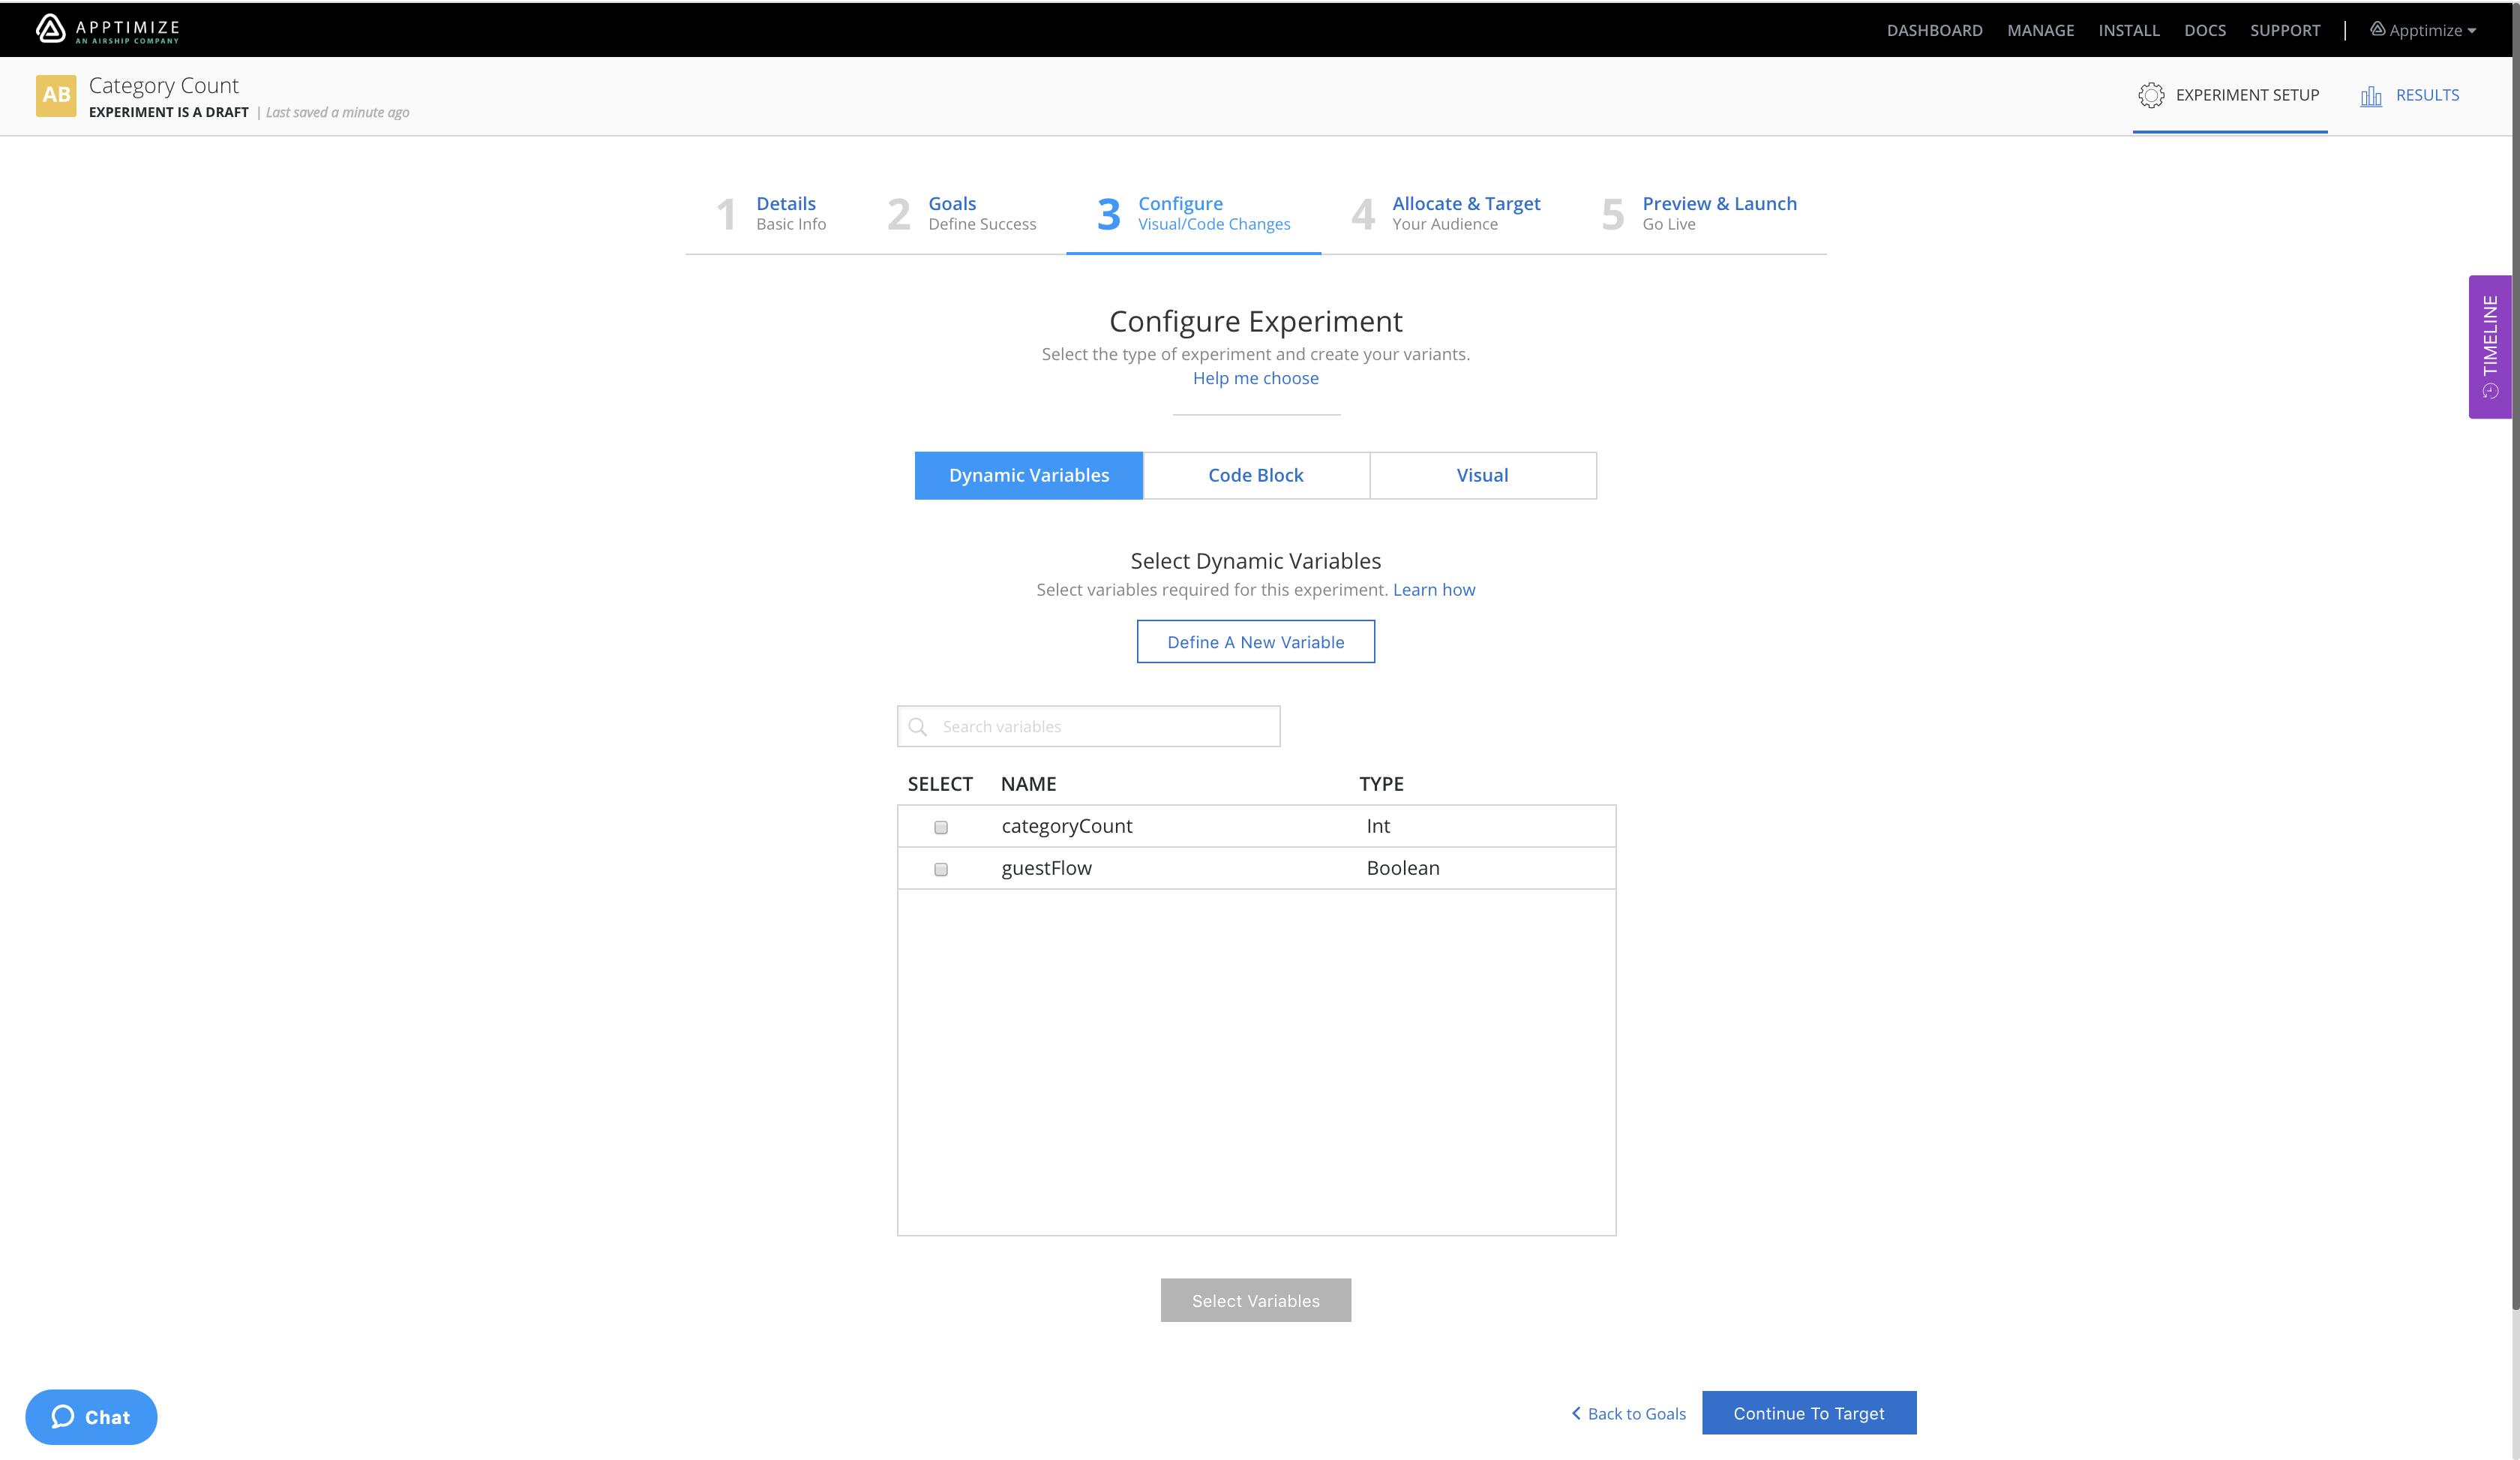 Dynamic Variable A/B Experiments — Apptimize documentation